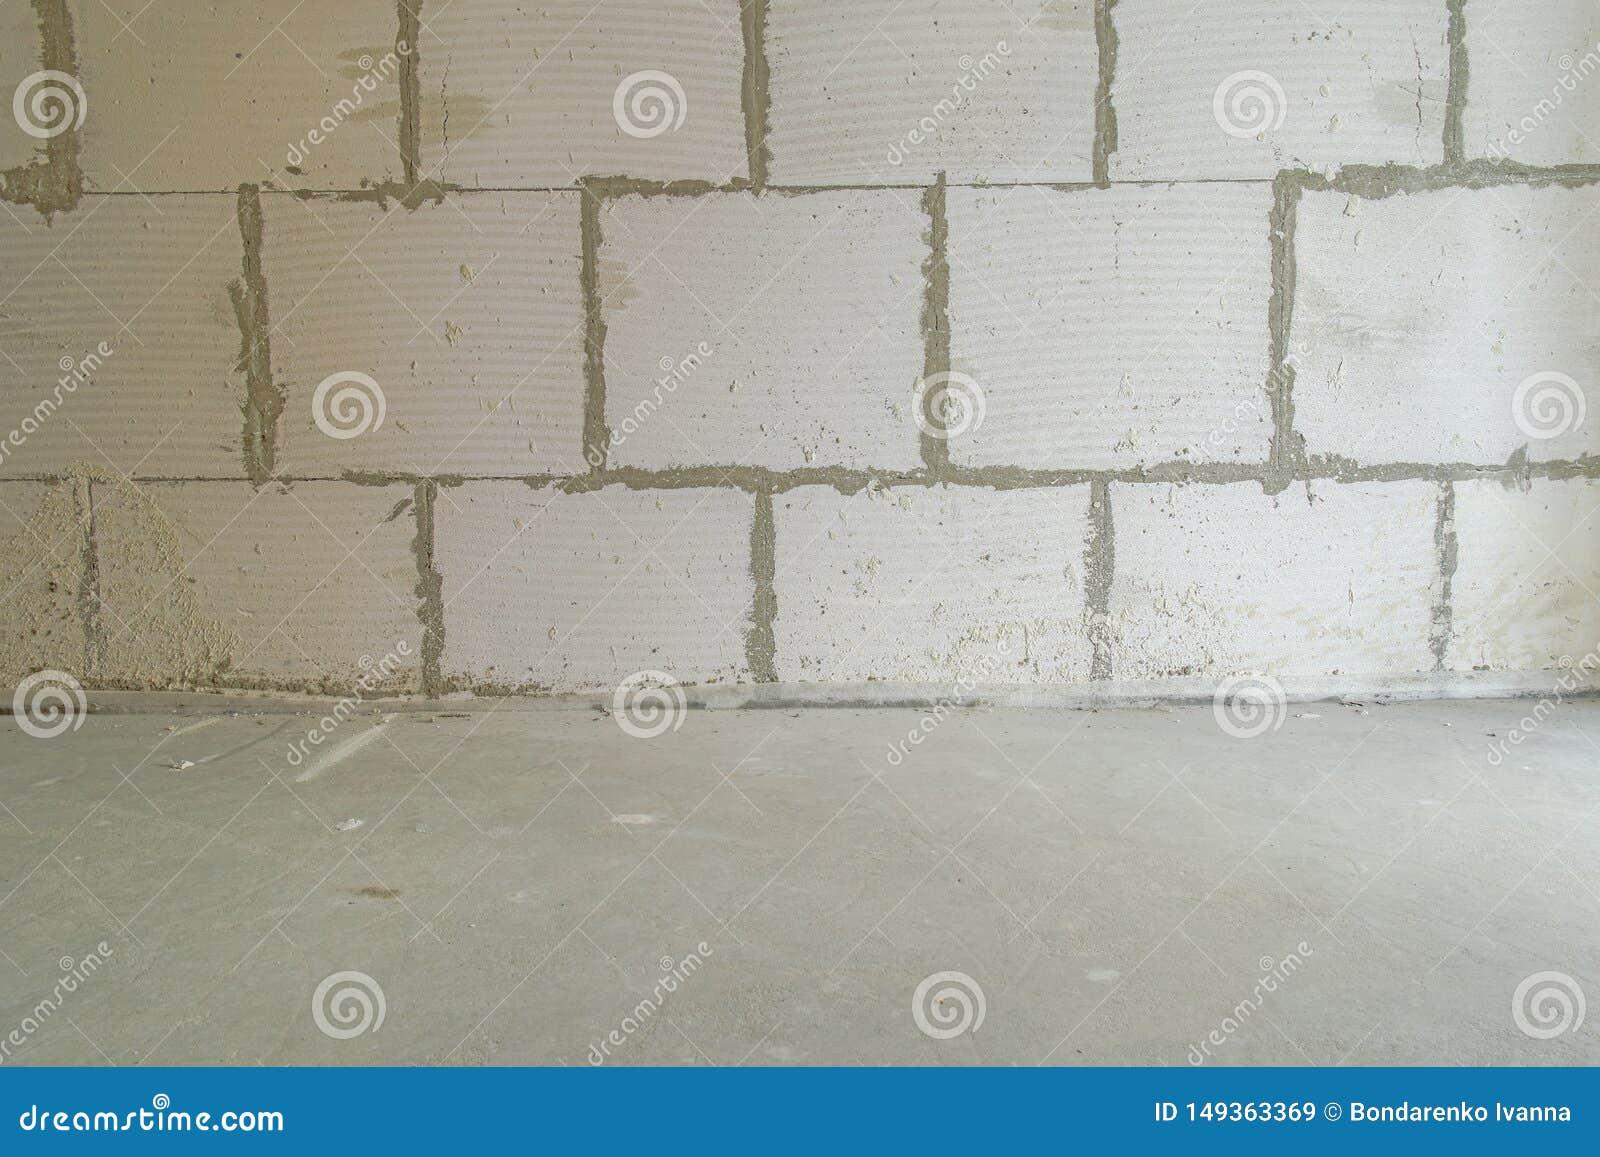 Газа бетон штанги из бетона